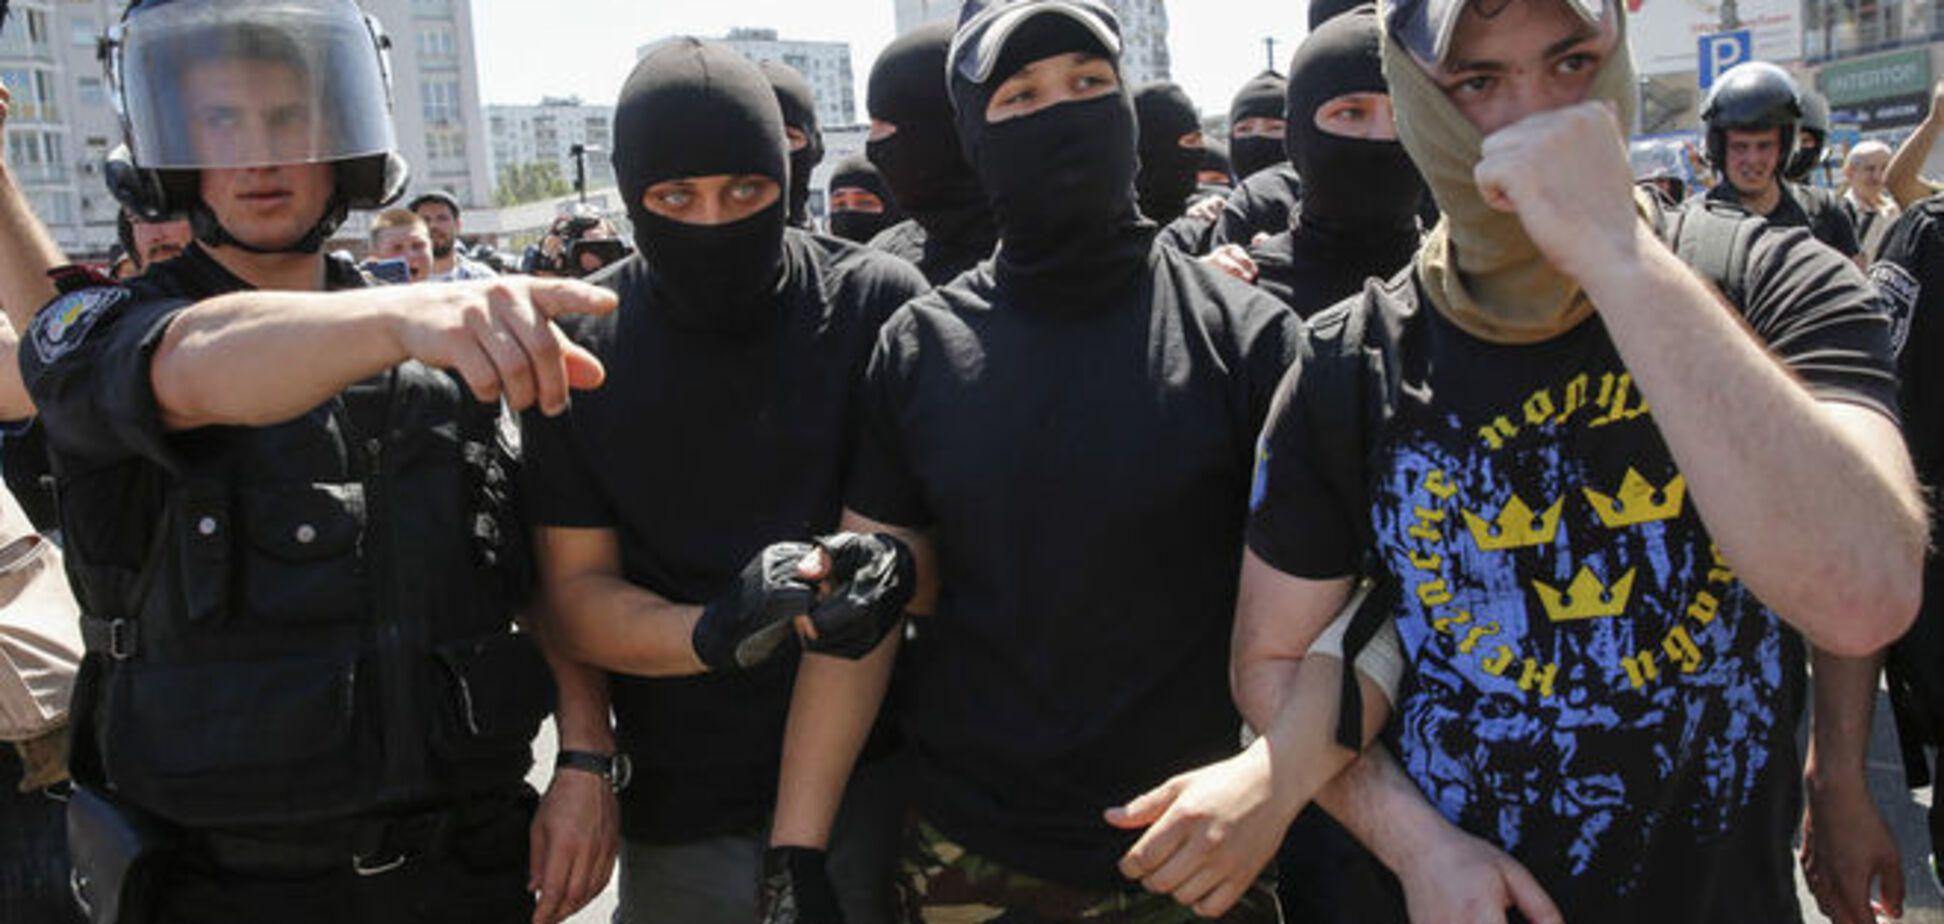 Гей-парад, нацисты, хомяки и новый Майдан